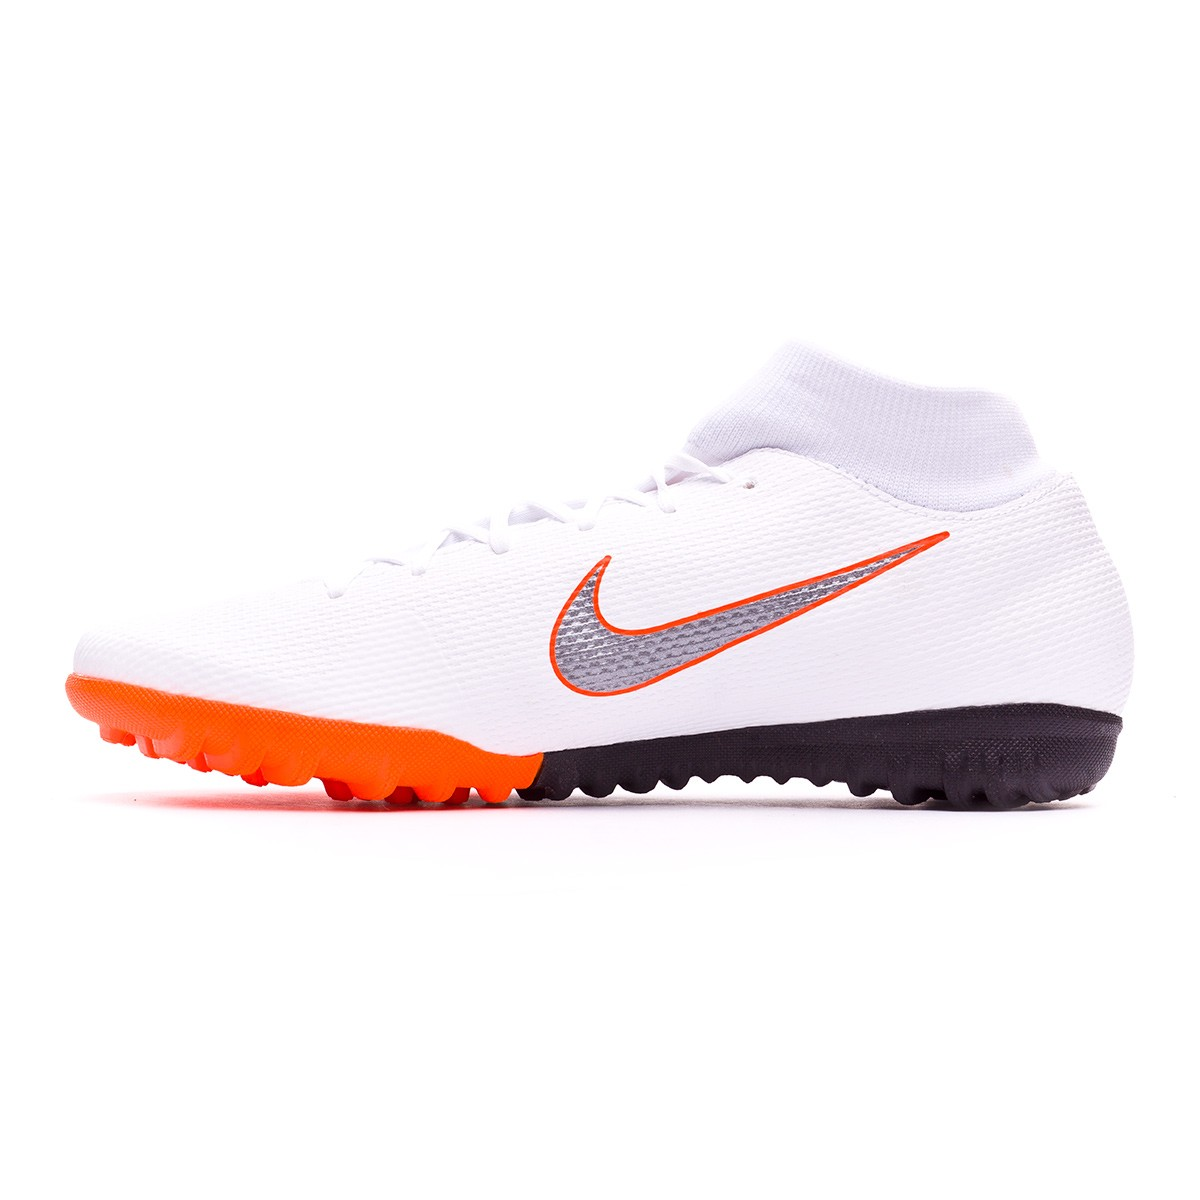 official photos eac23 0acbb Football Boot Nike Mercurial SuperflyX VI Academy Turf White-Metallic cool  grey-Total orange - Tienda de fútbol Fútbol Emotion